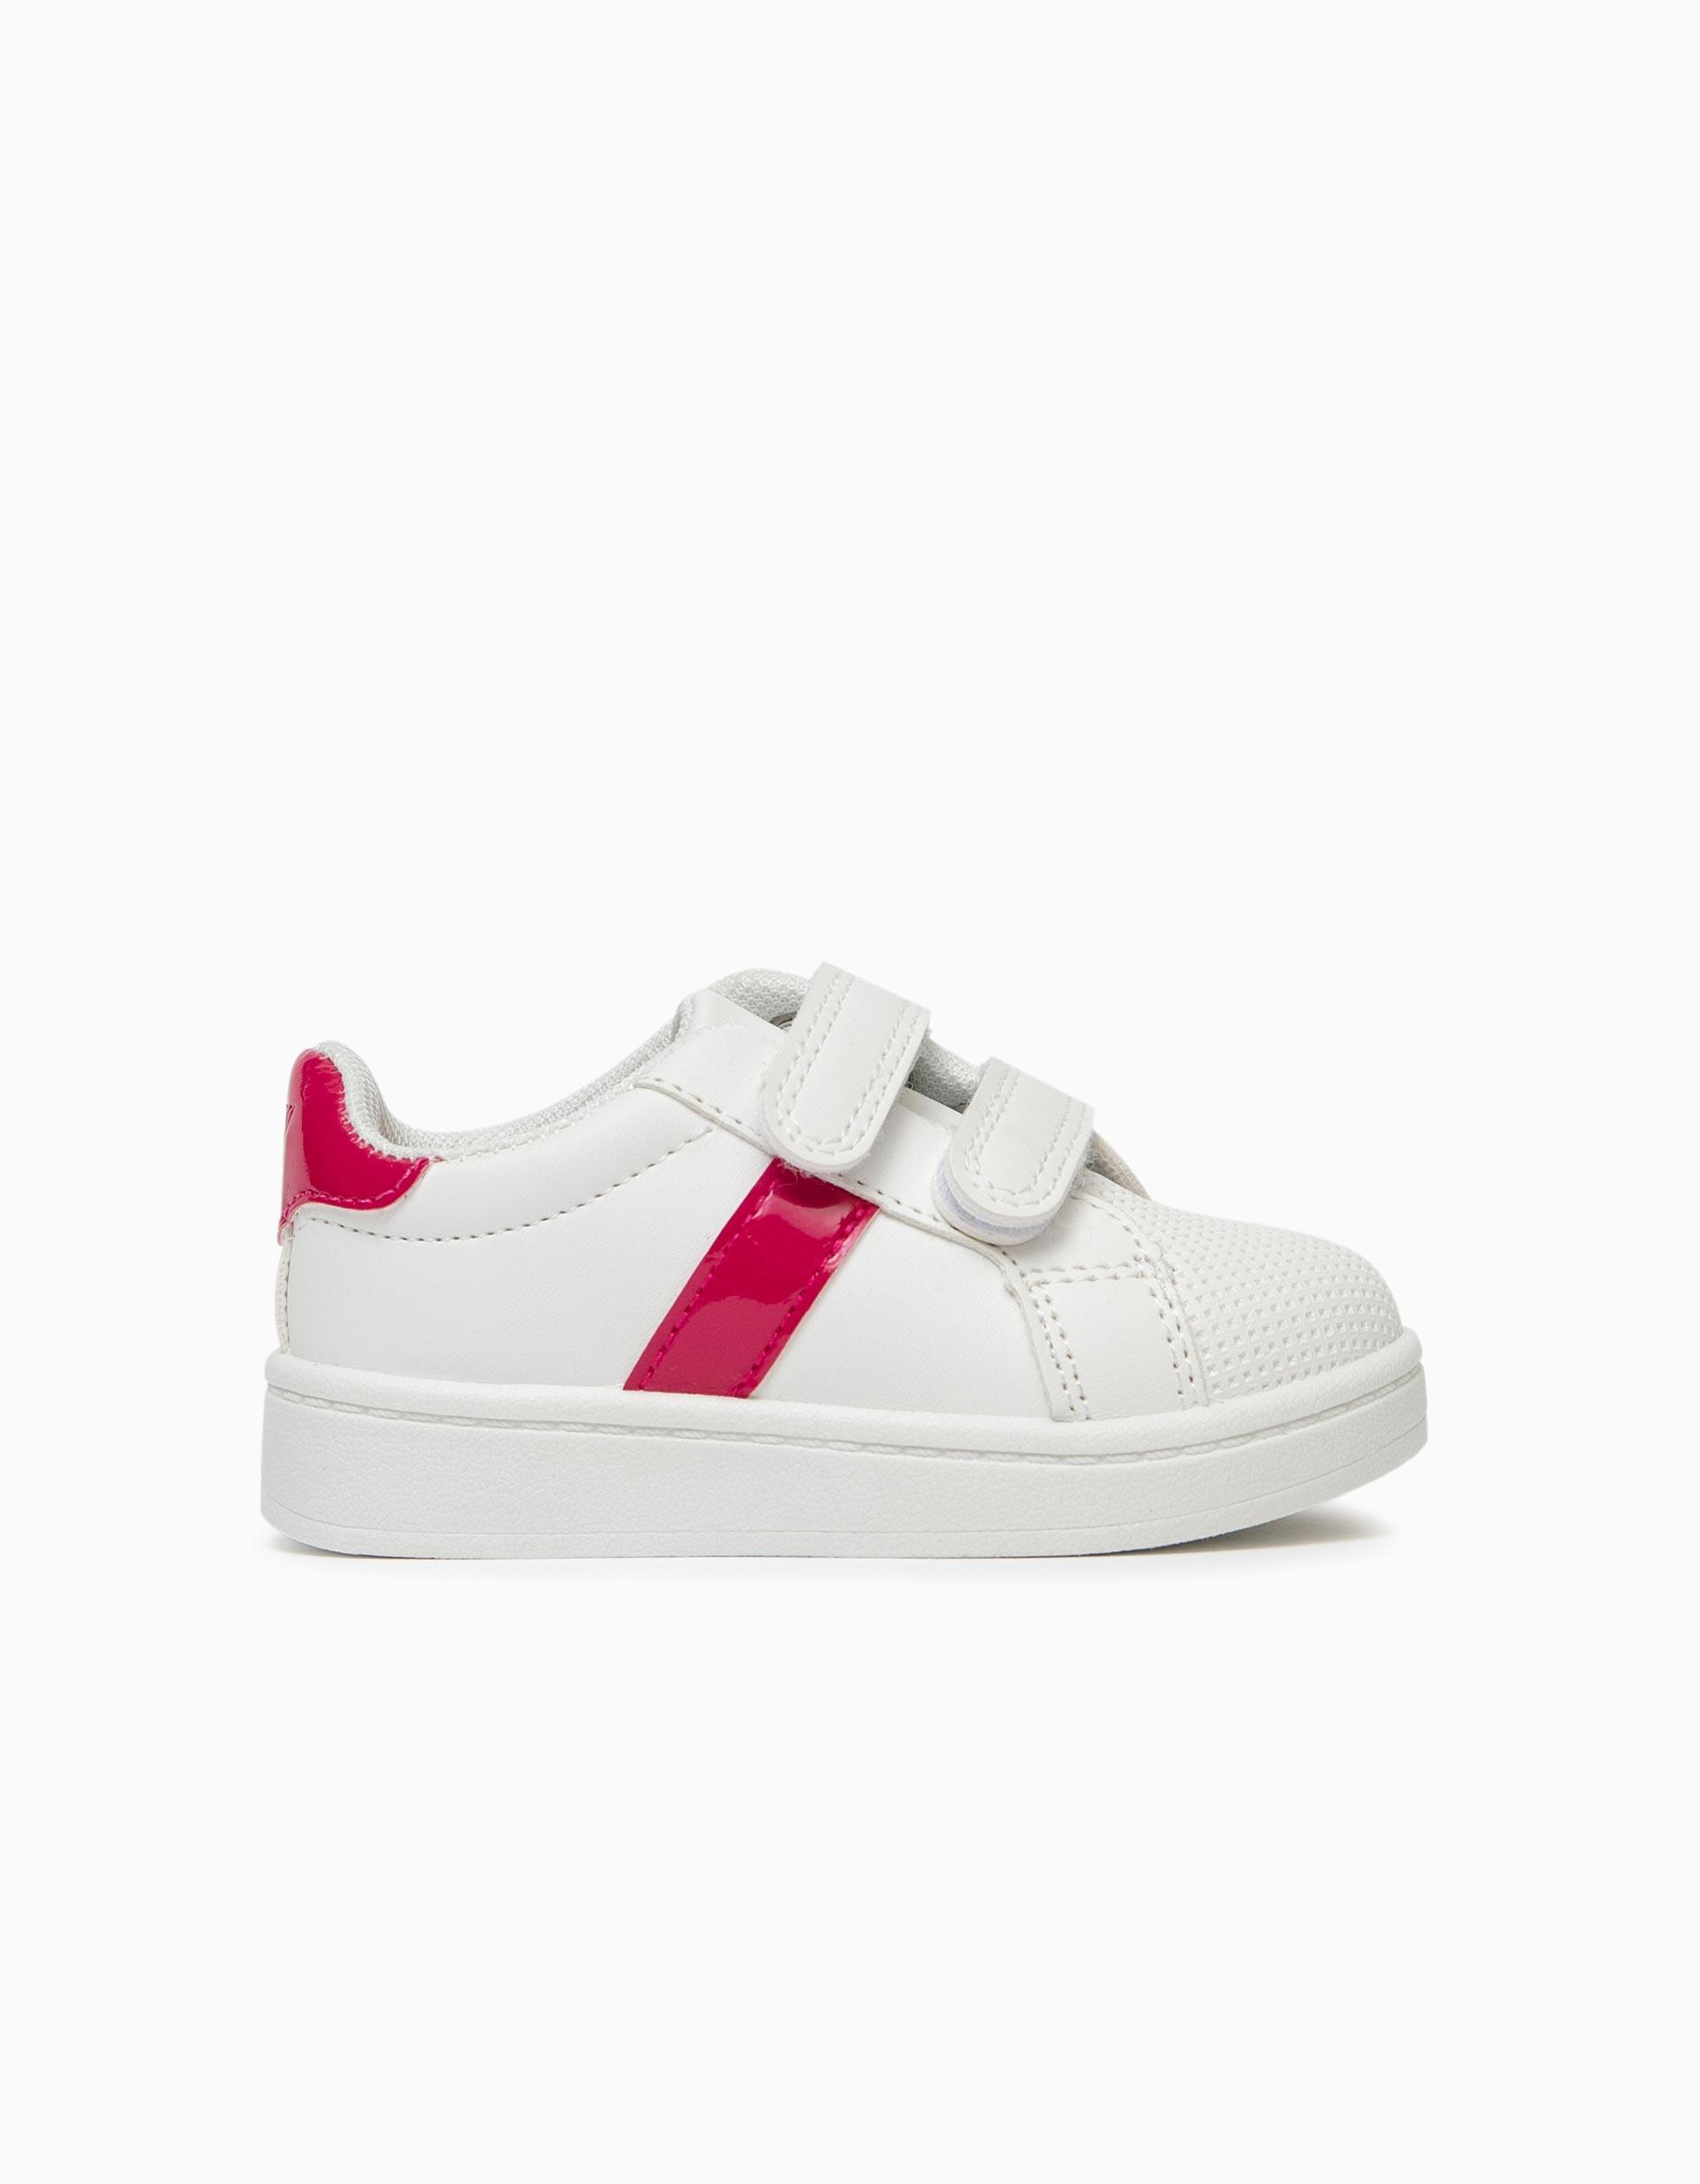 Sapatilhas para Bebé Menina, Branco/Rosa